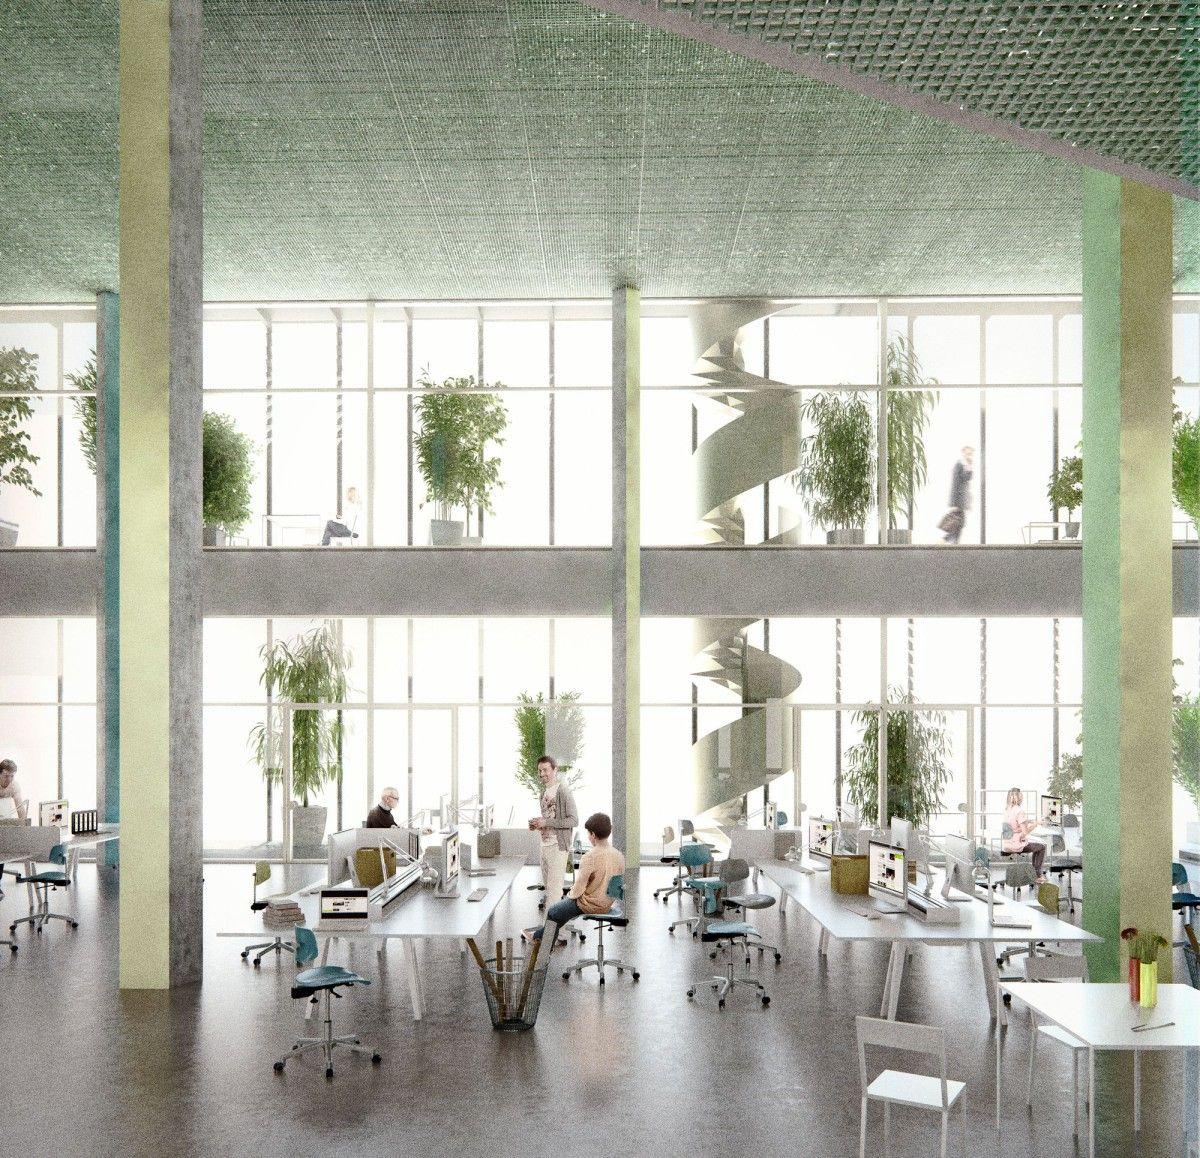 ┬® Make Me _ Robbrecht en Daem architecten en Dierendonckblancke architecten